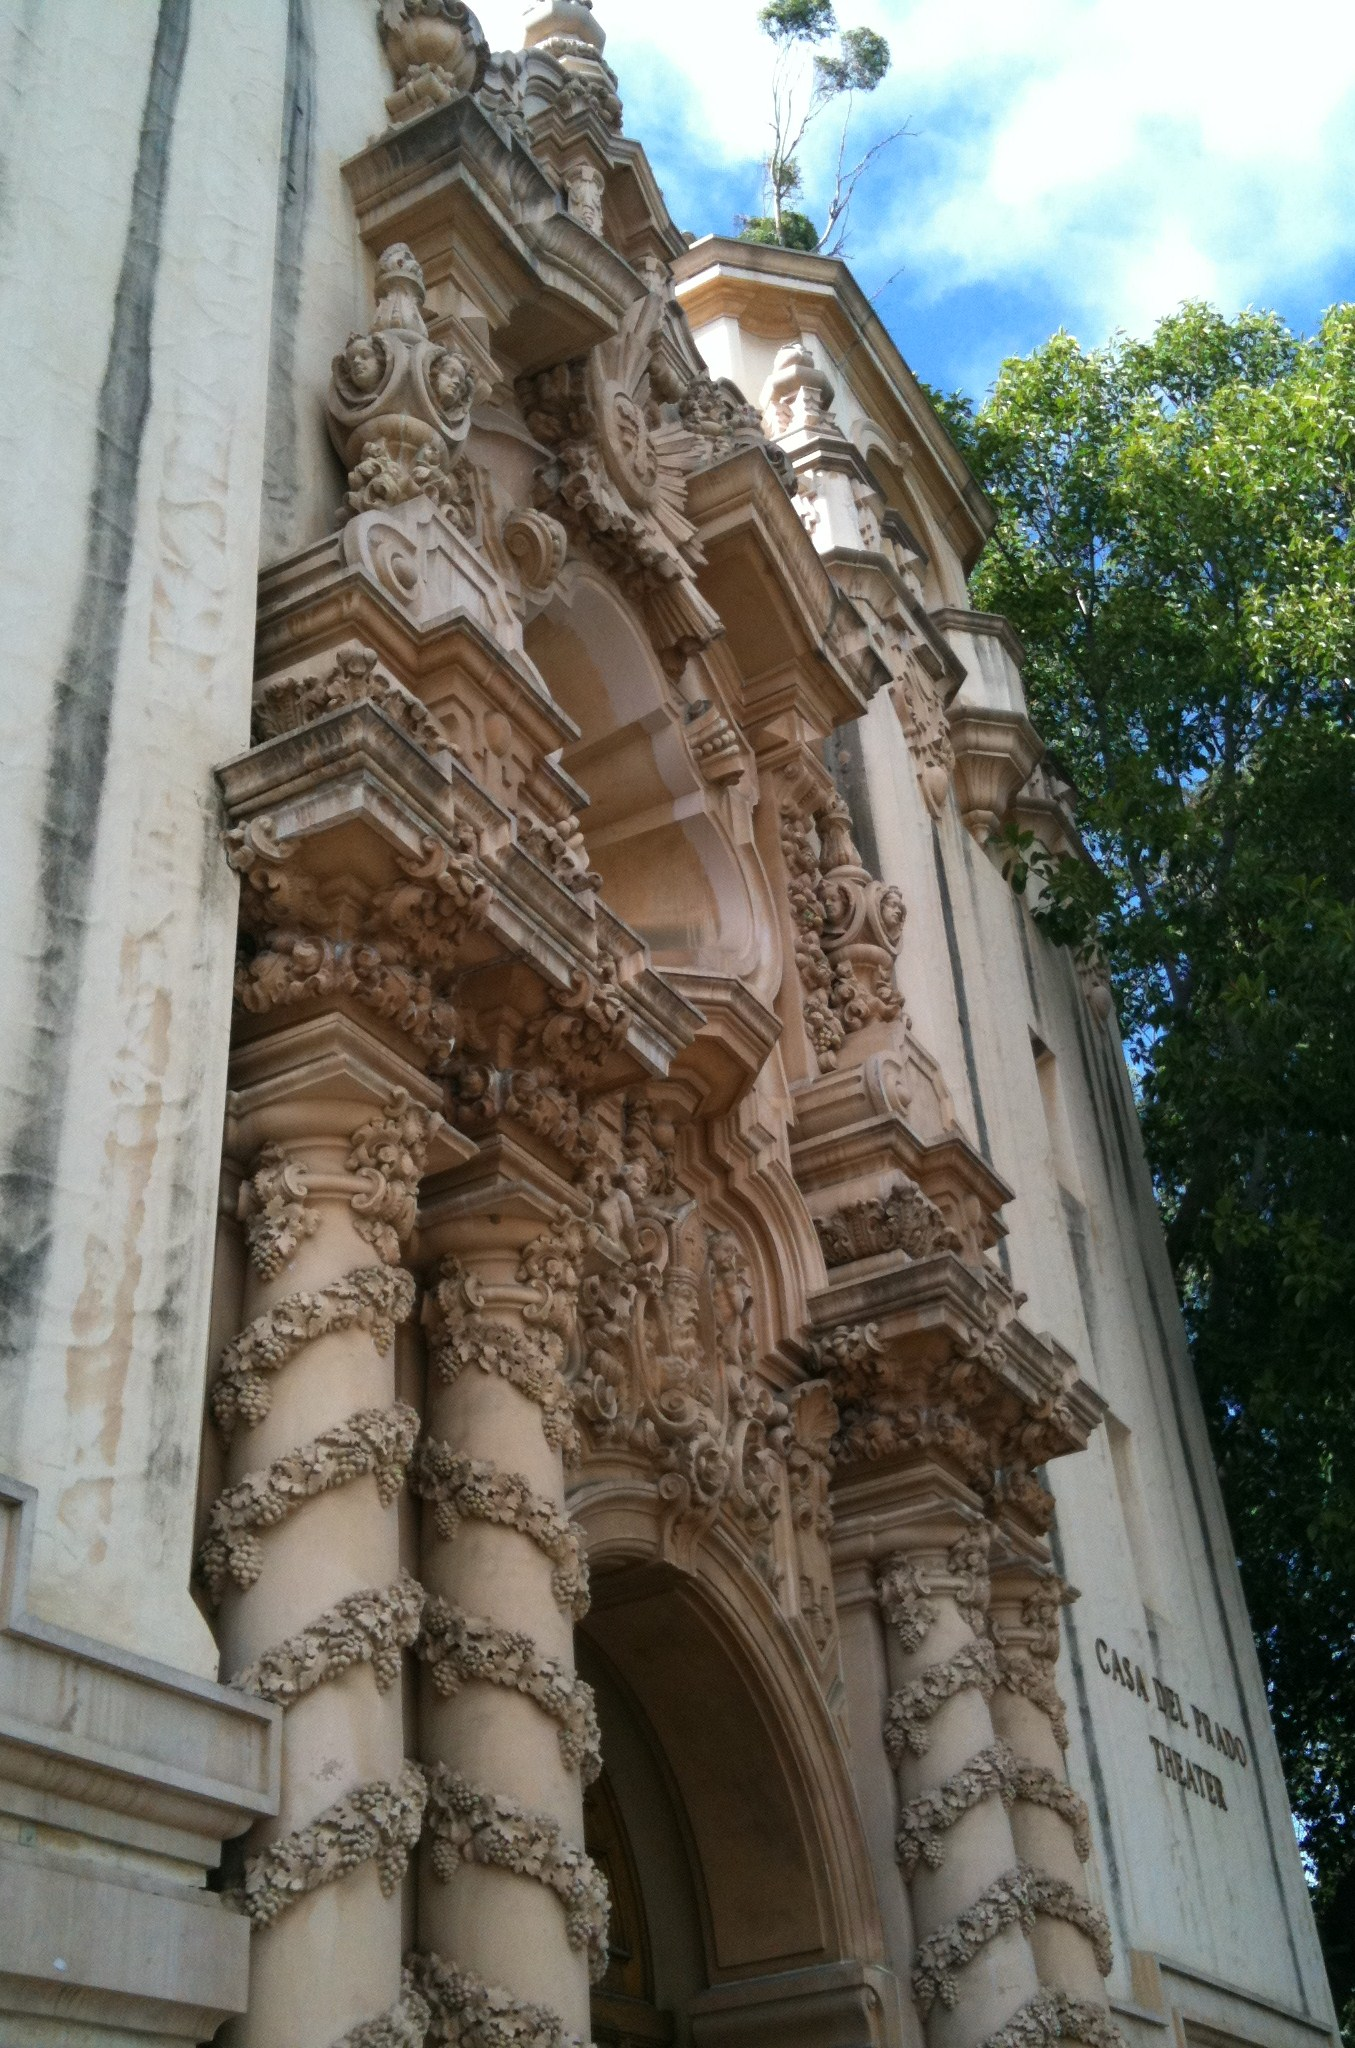 Casa del Prado theater